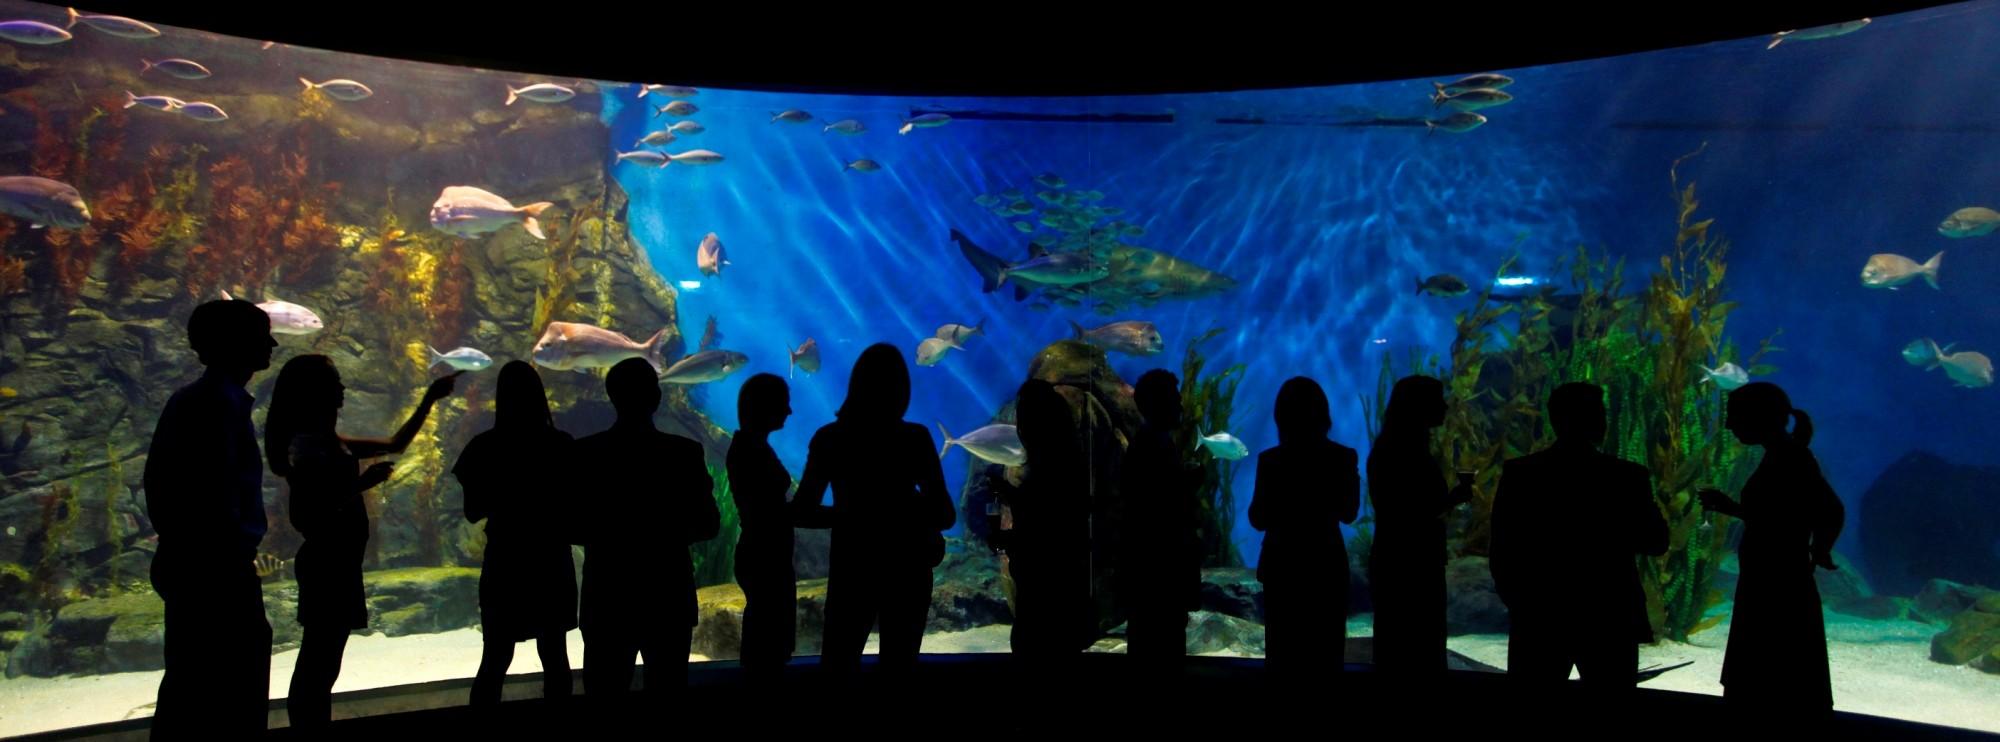 Sea Life Melbourne Aquarium Book Amp Save With Venuemob